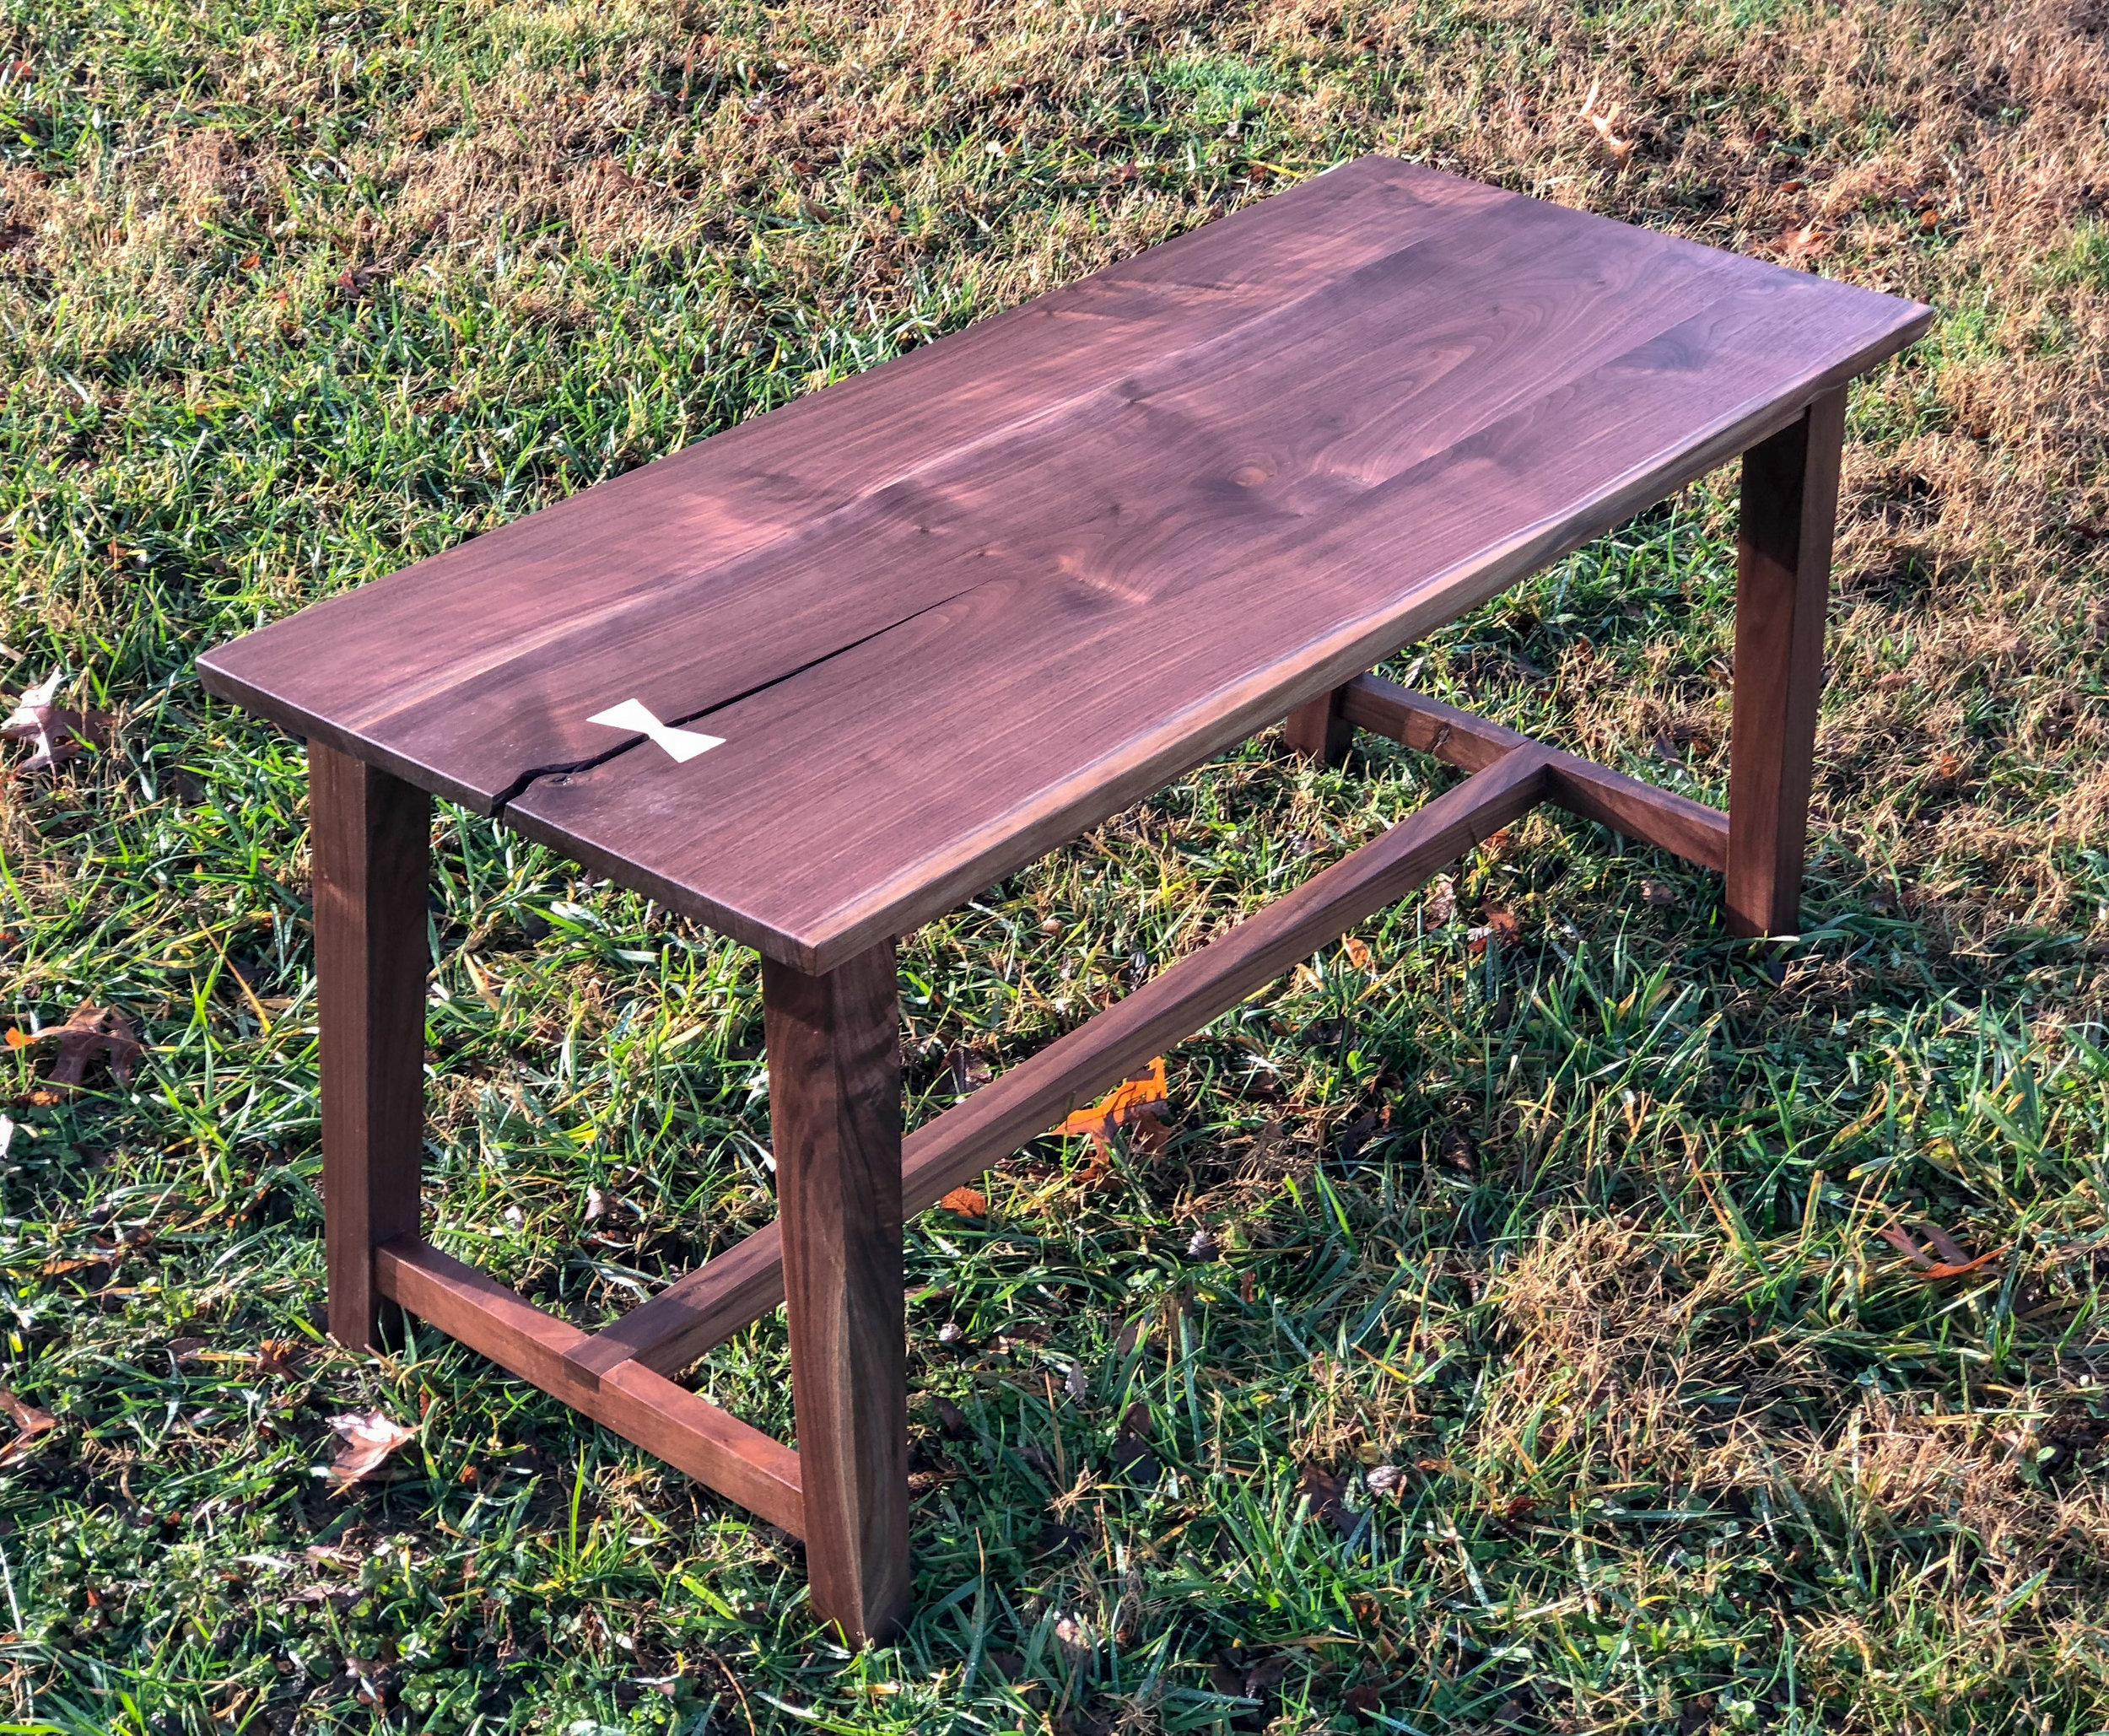 Custom Walnut Bench with bow tie joinery